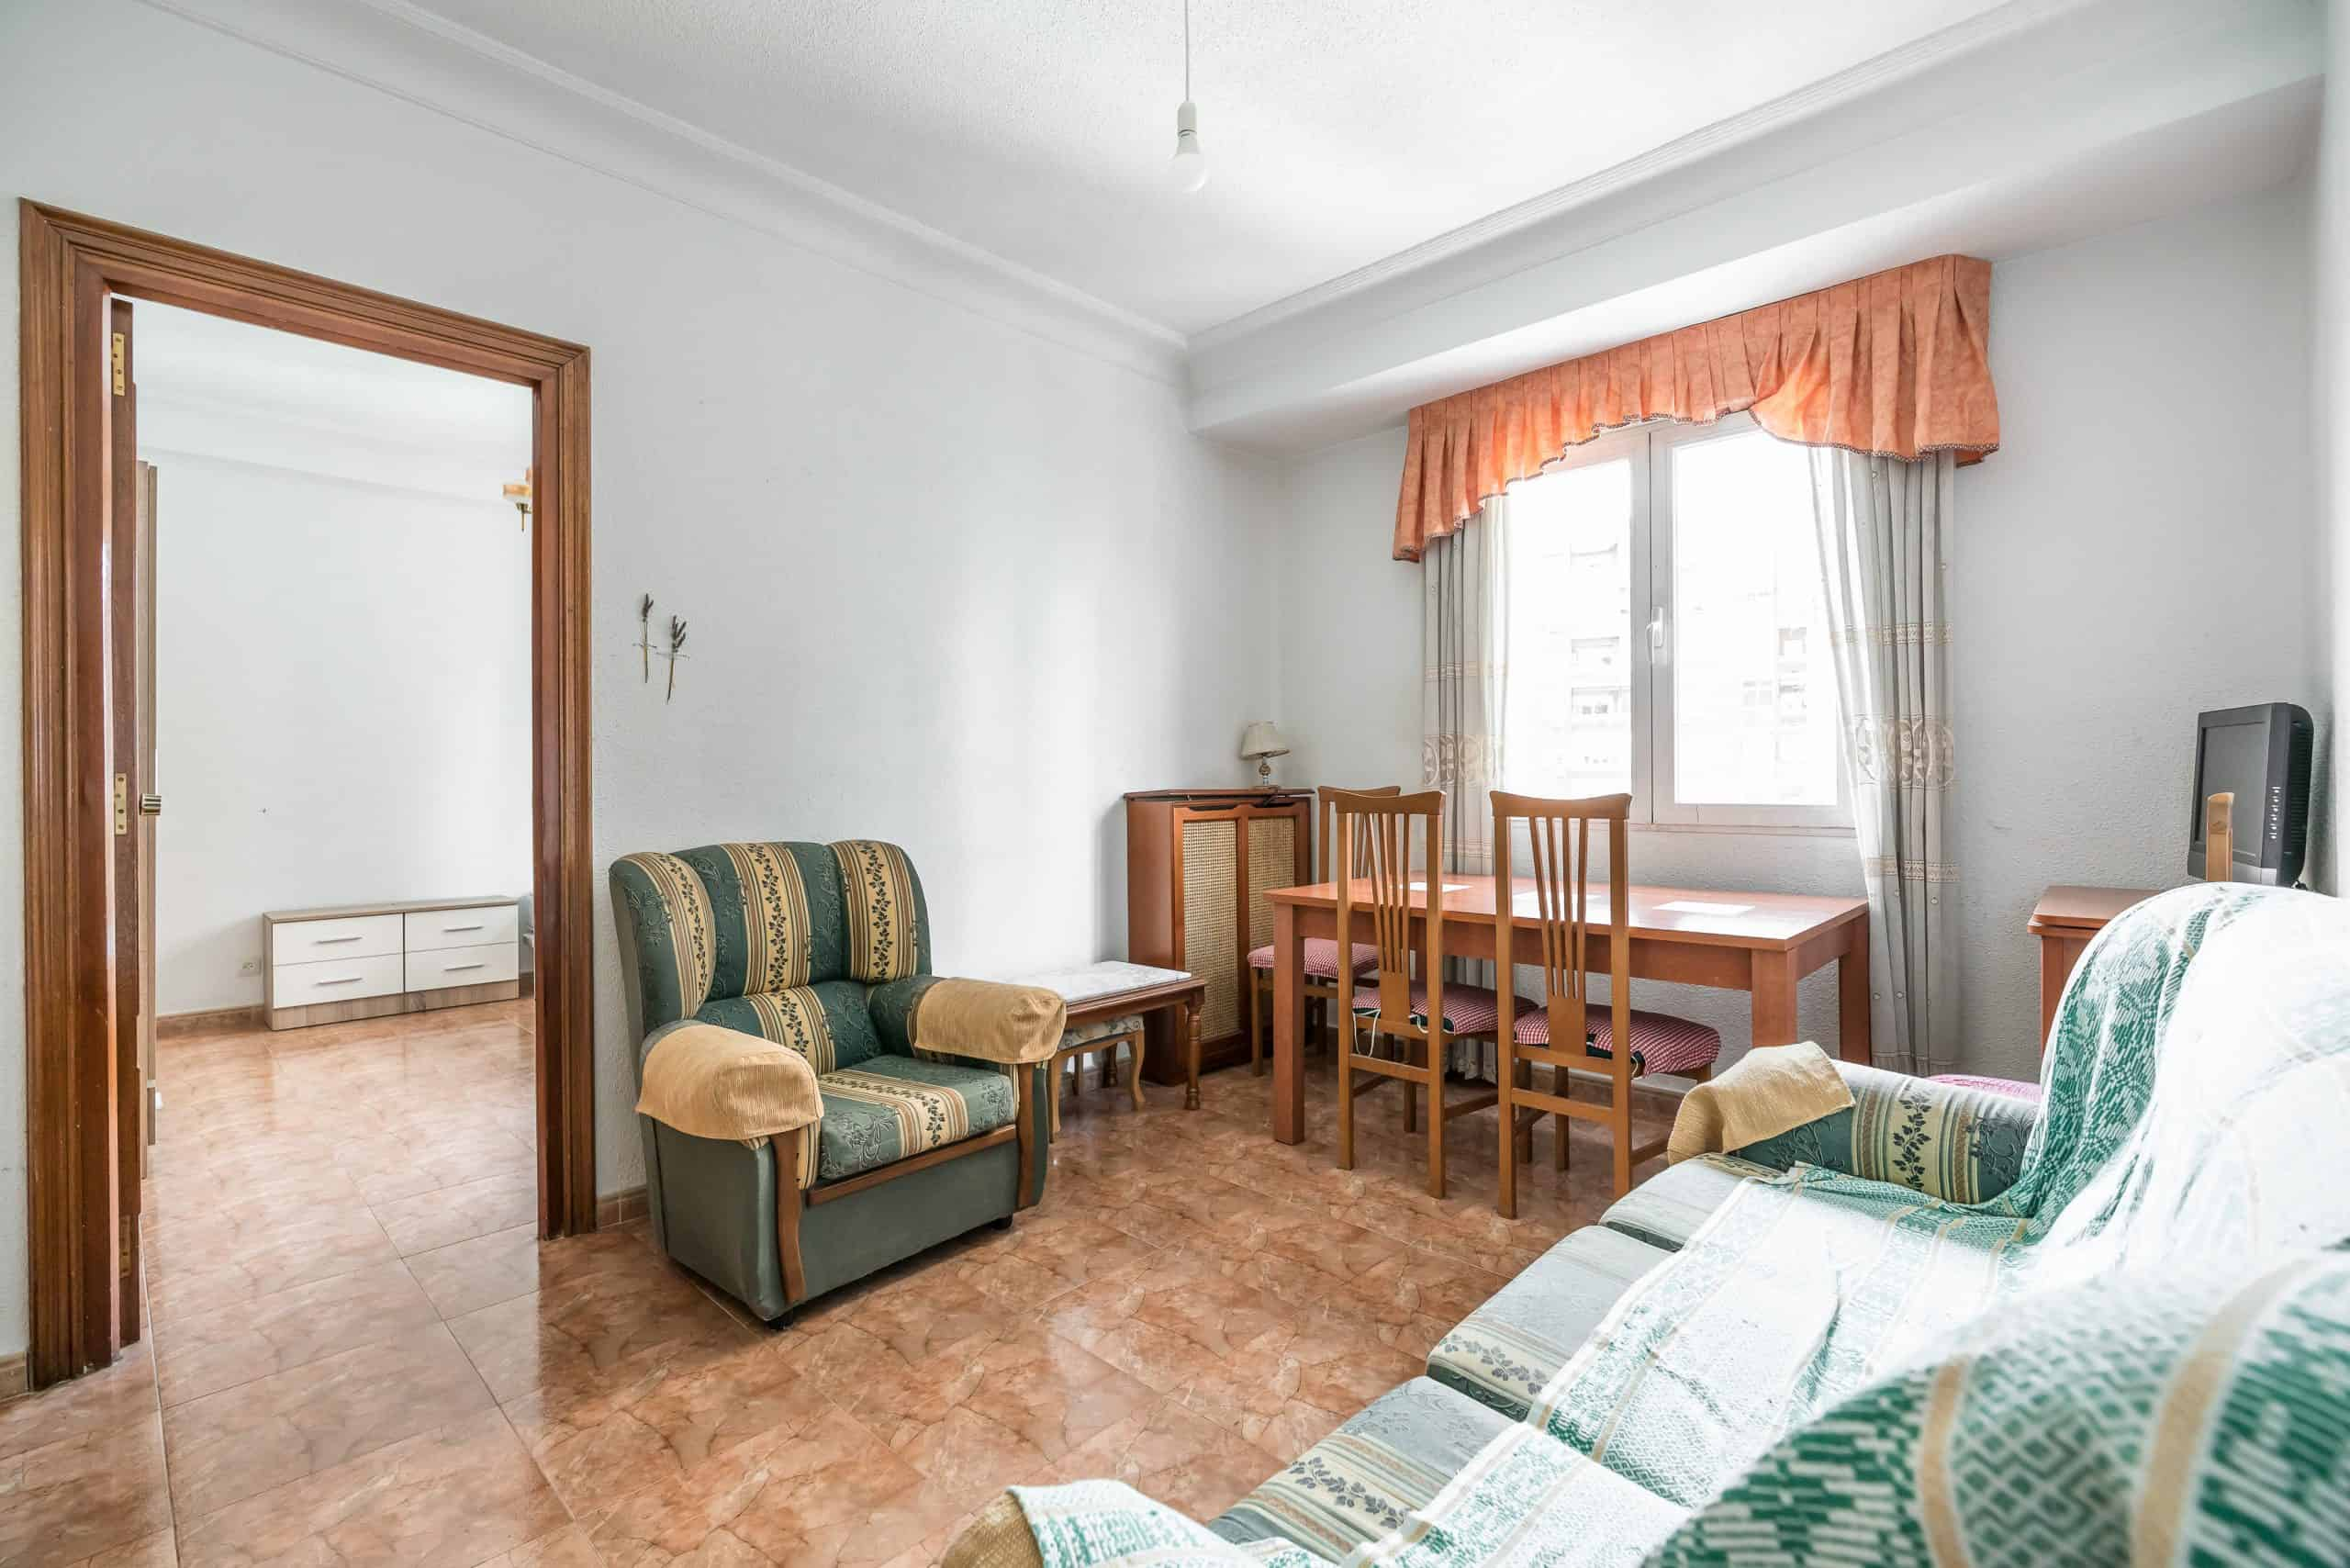 Agencia Inmobiliaria de Madrid-FUTUROCASA-calle Embajadores-Chopera-Arganzuela-1 SALON (0)